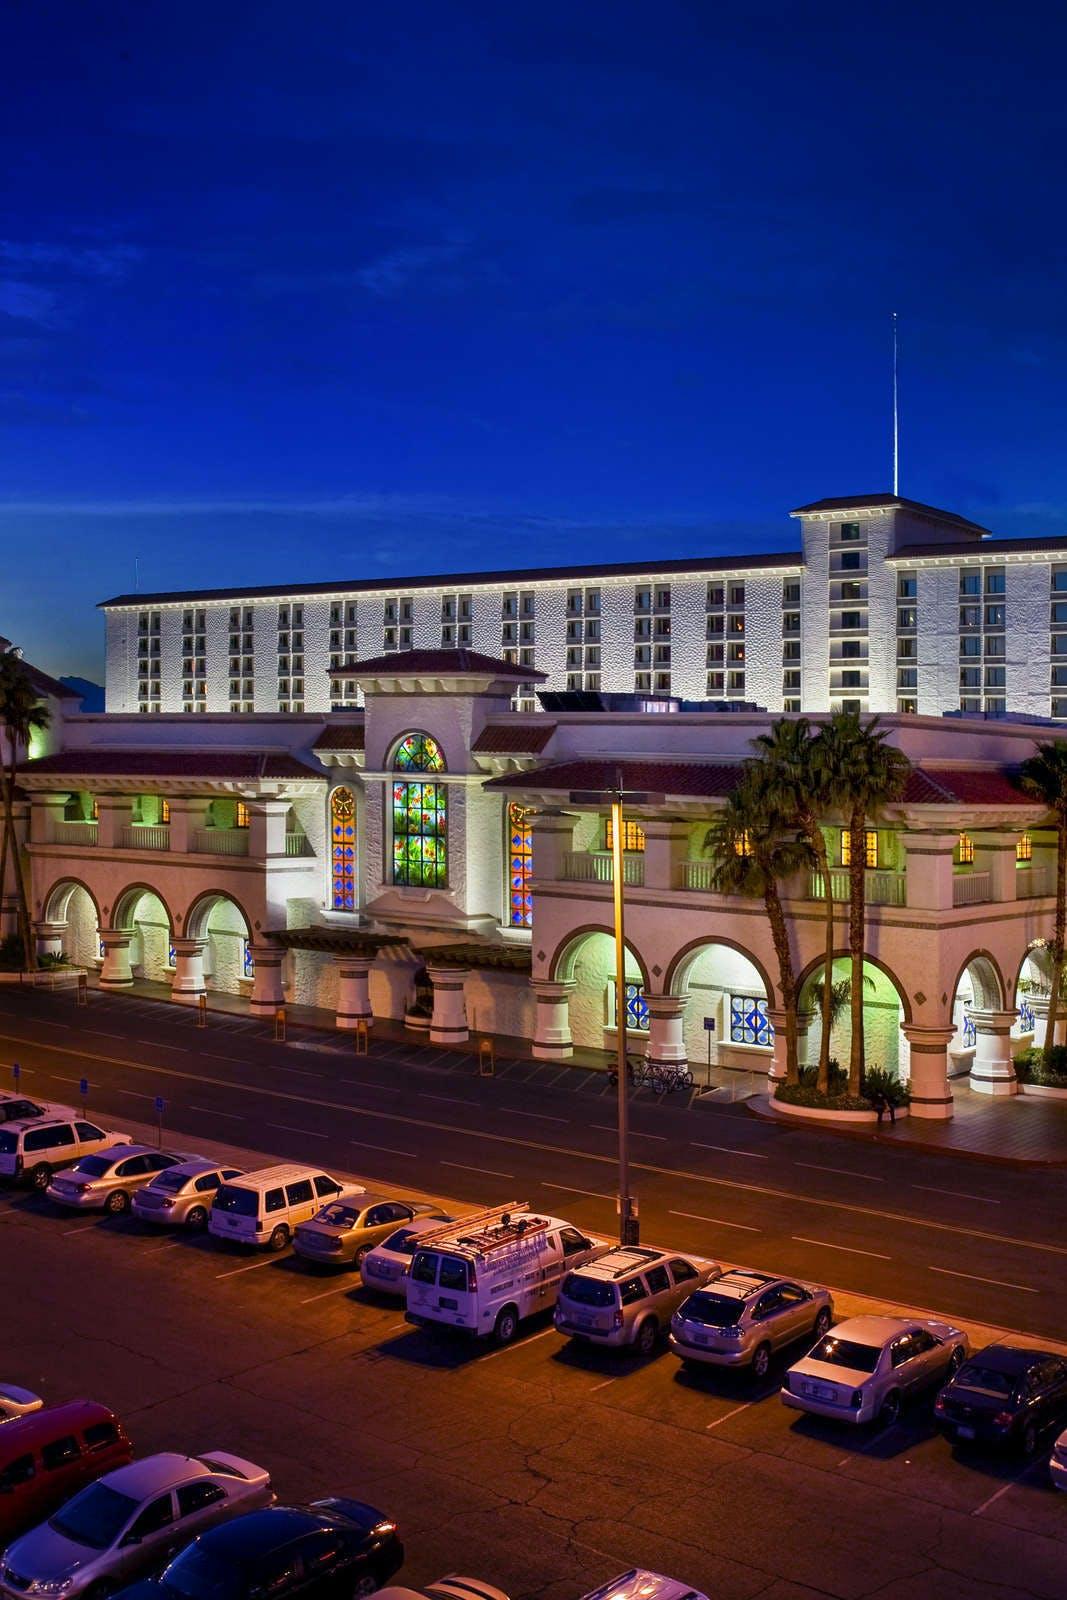 Gold Coast Hotel and Casino